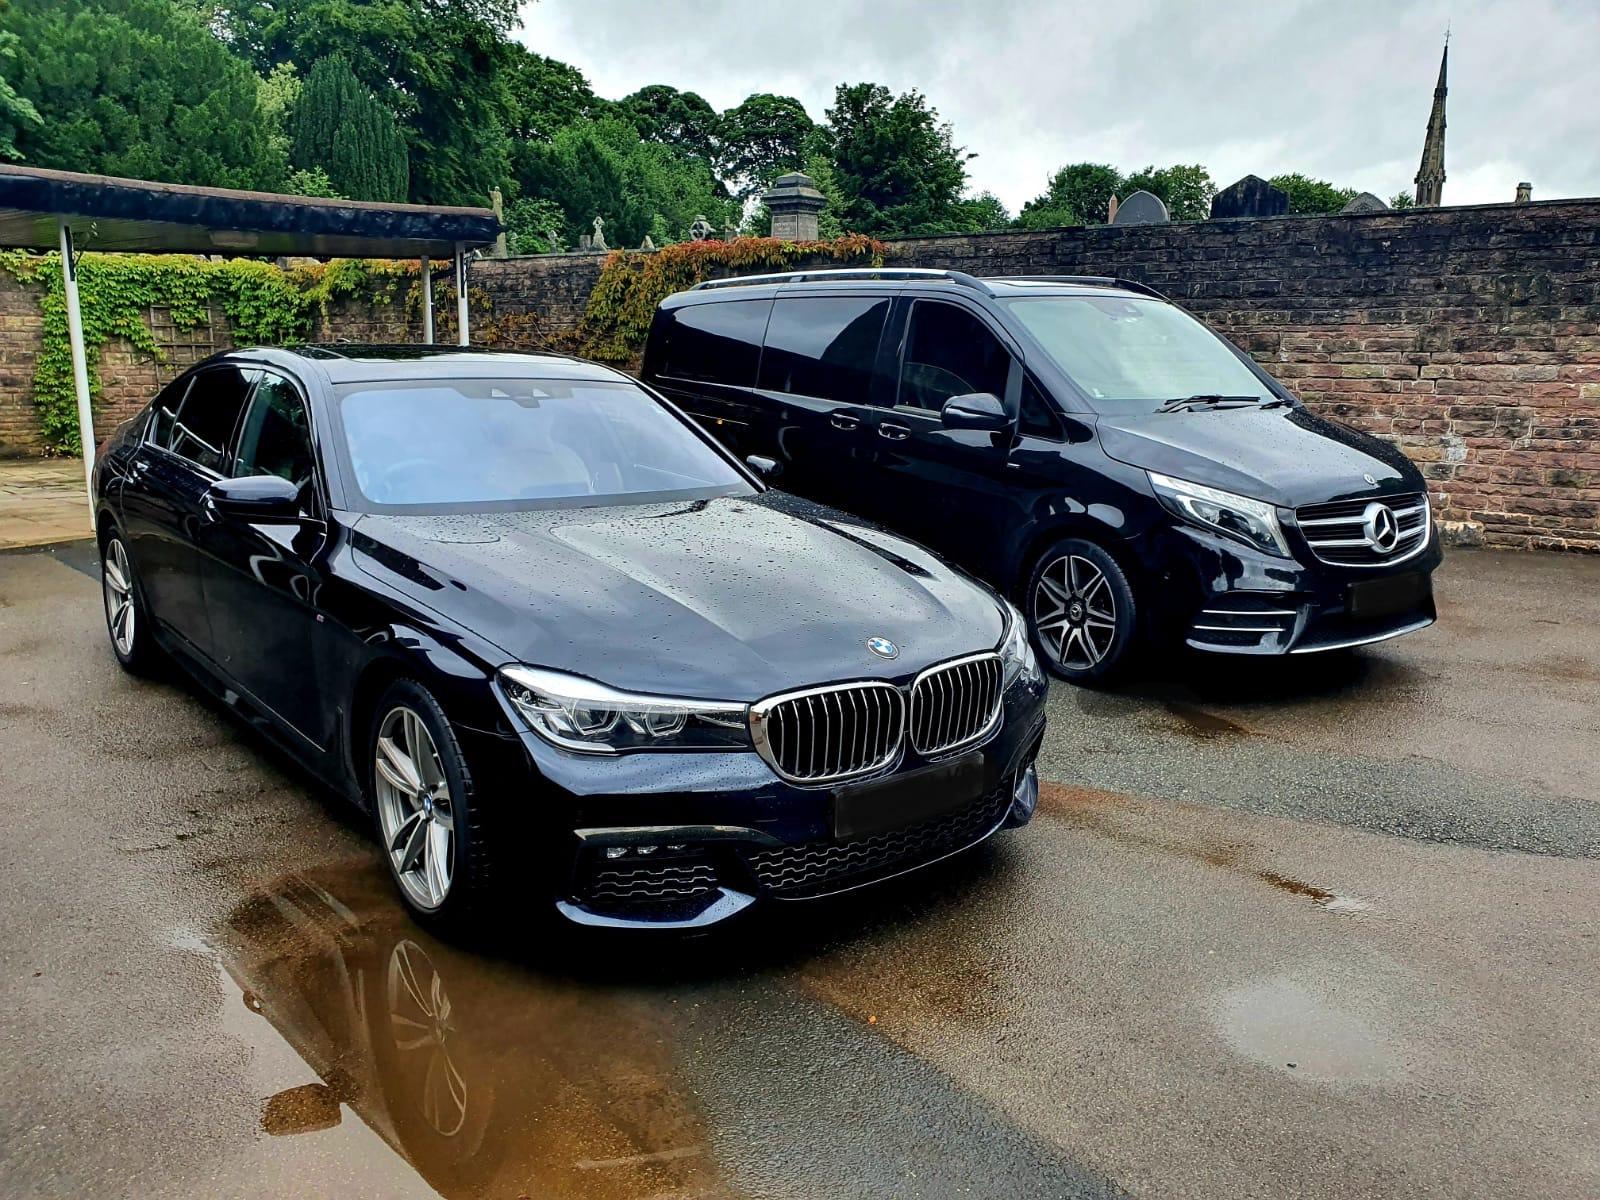 SK executive new fleet